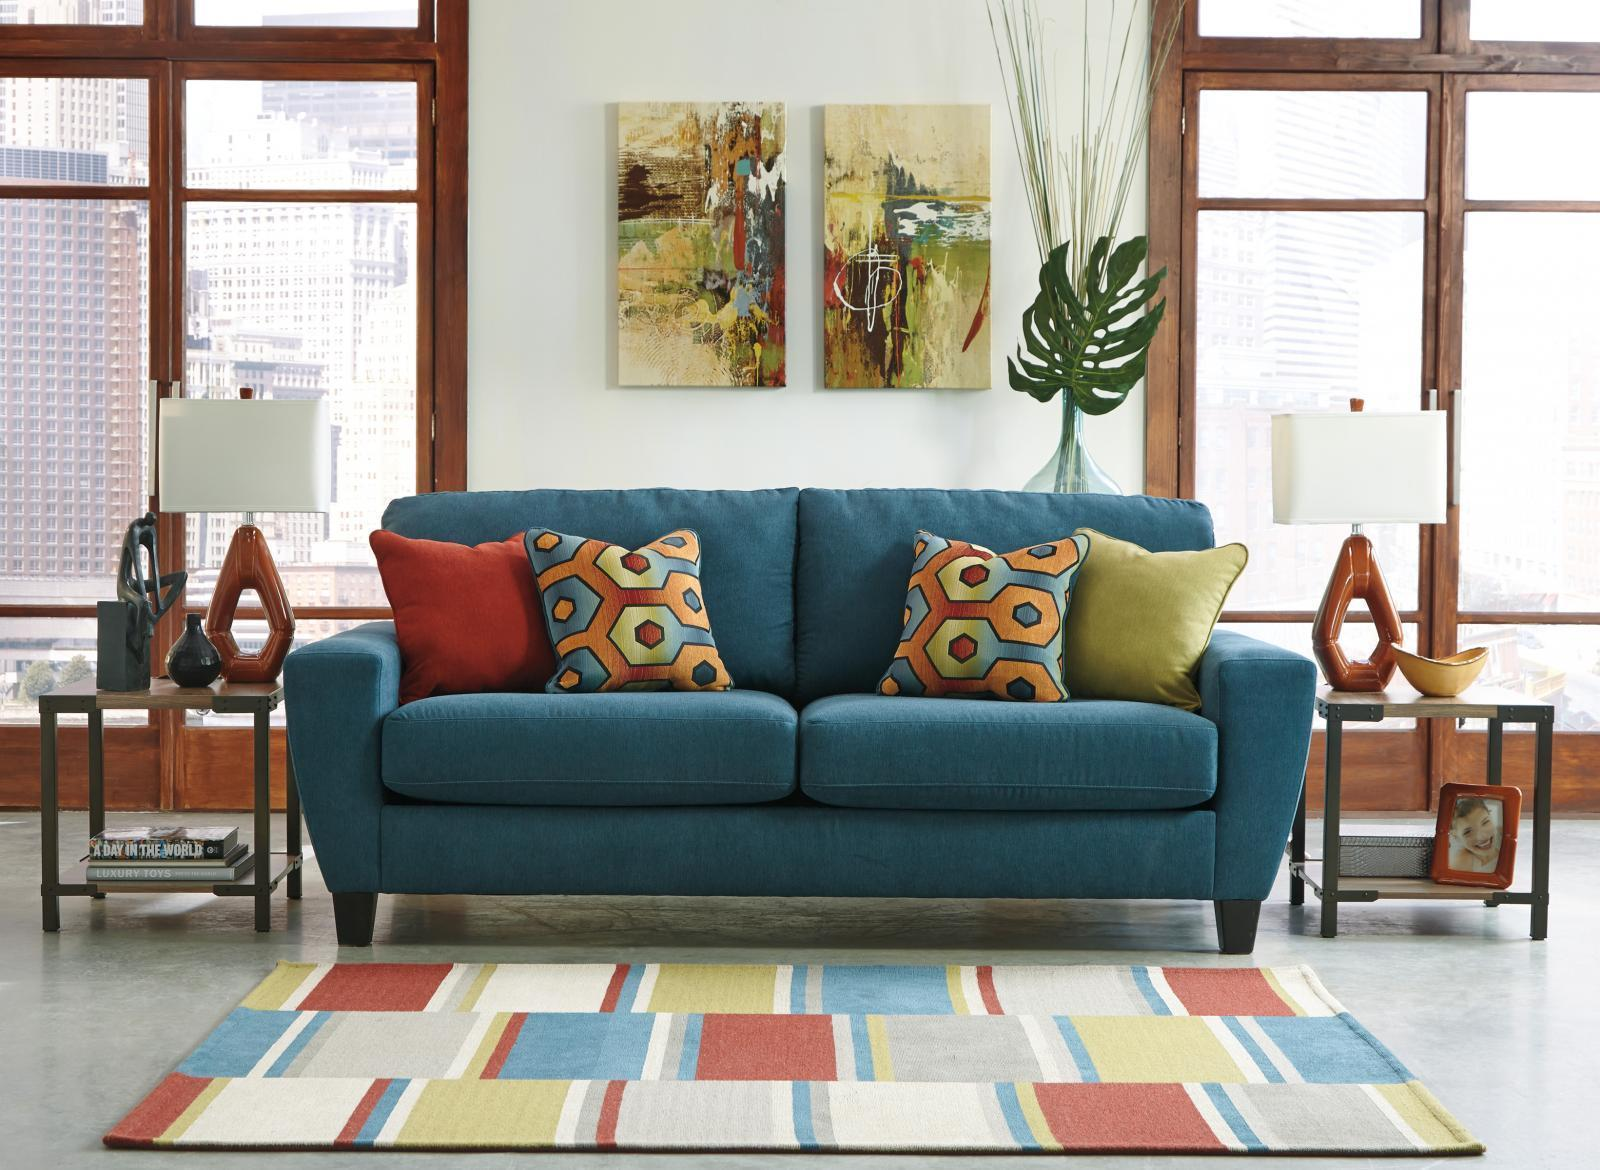 Ashley Sagen Living Room Set 4pcs In Teal Textured Microfiber Contemporary St